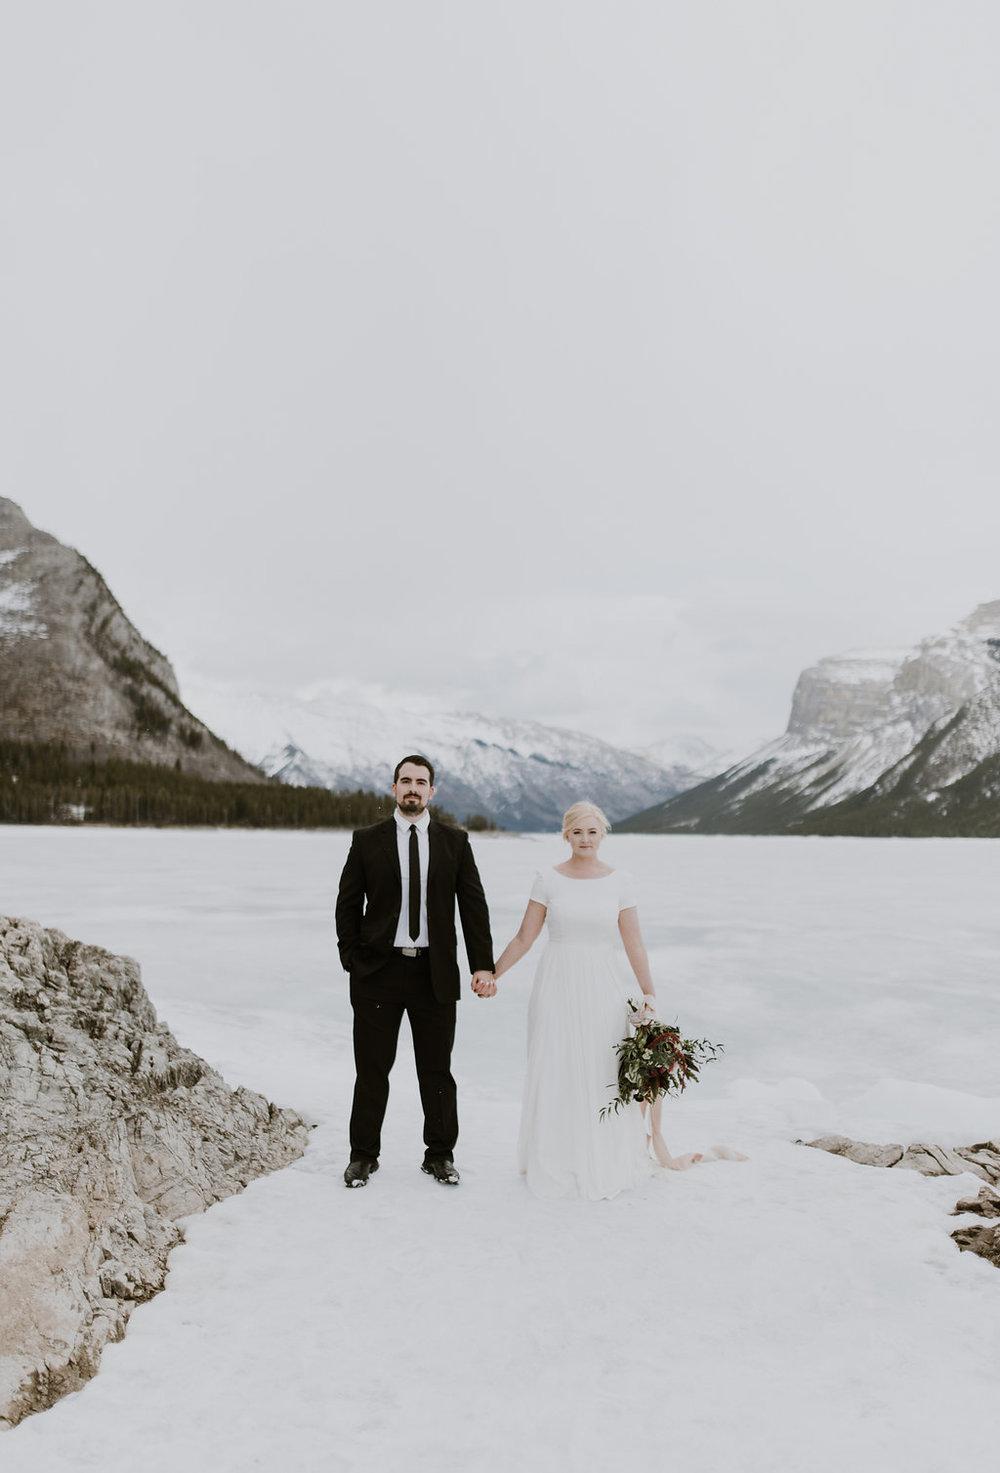 KatelynAnnePhotographyLakeMinnewankaElopement(164of189).jpg